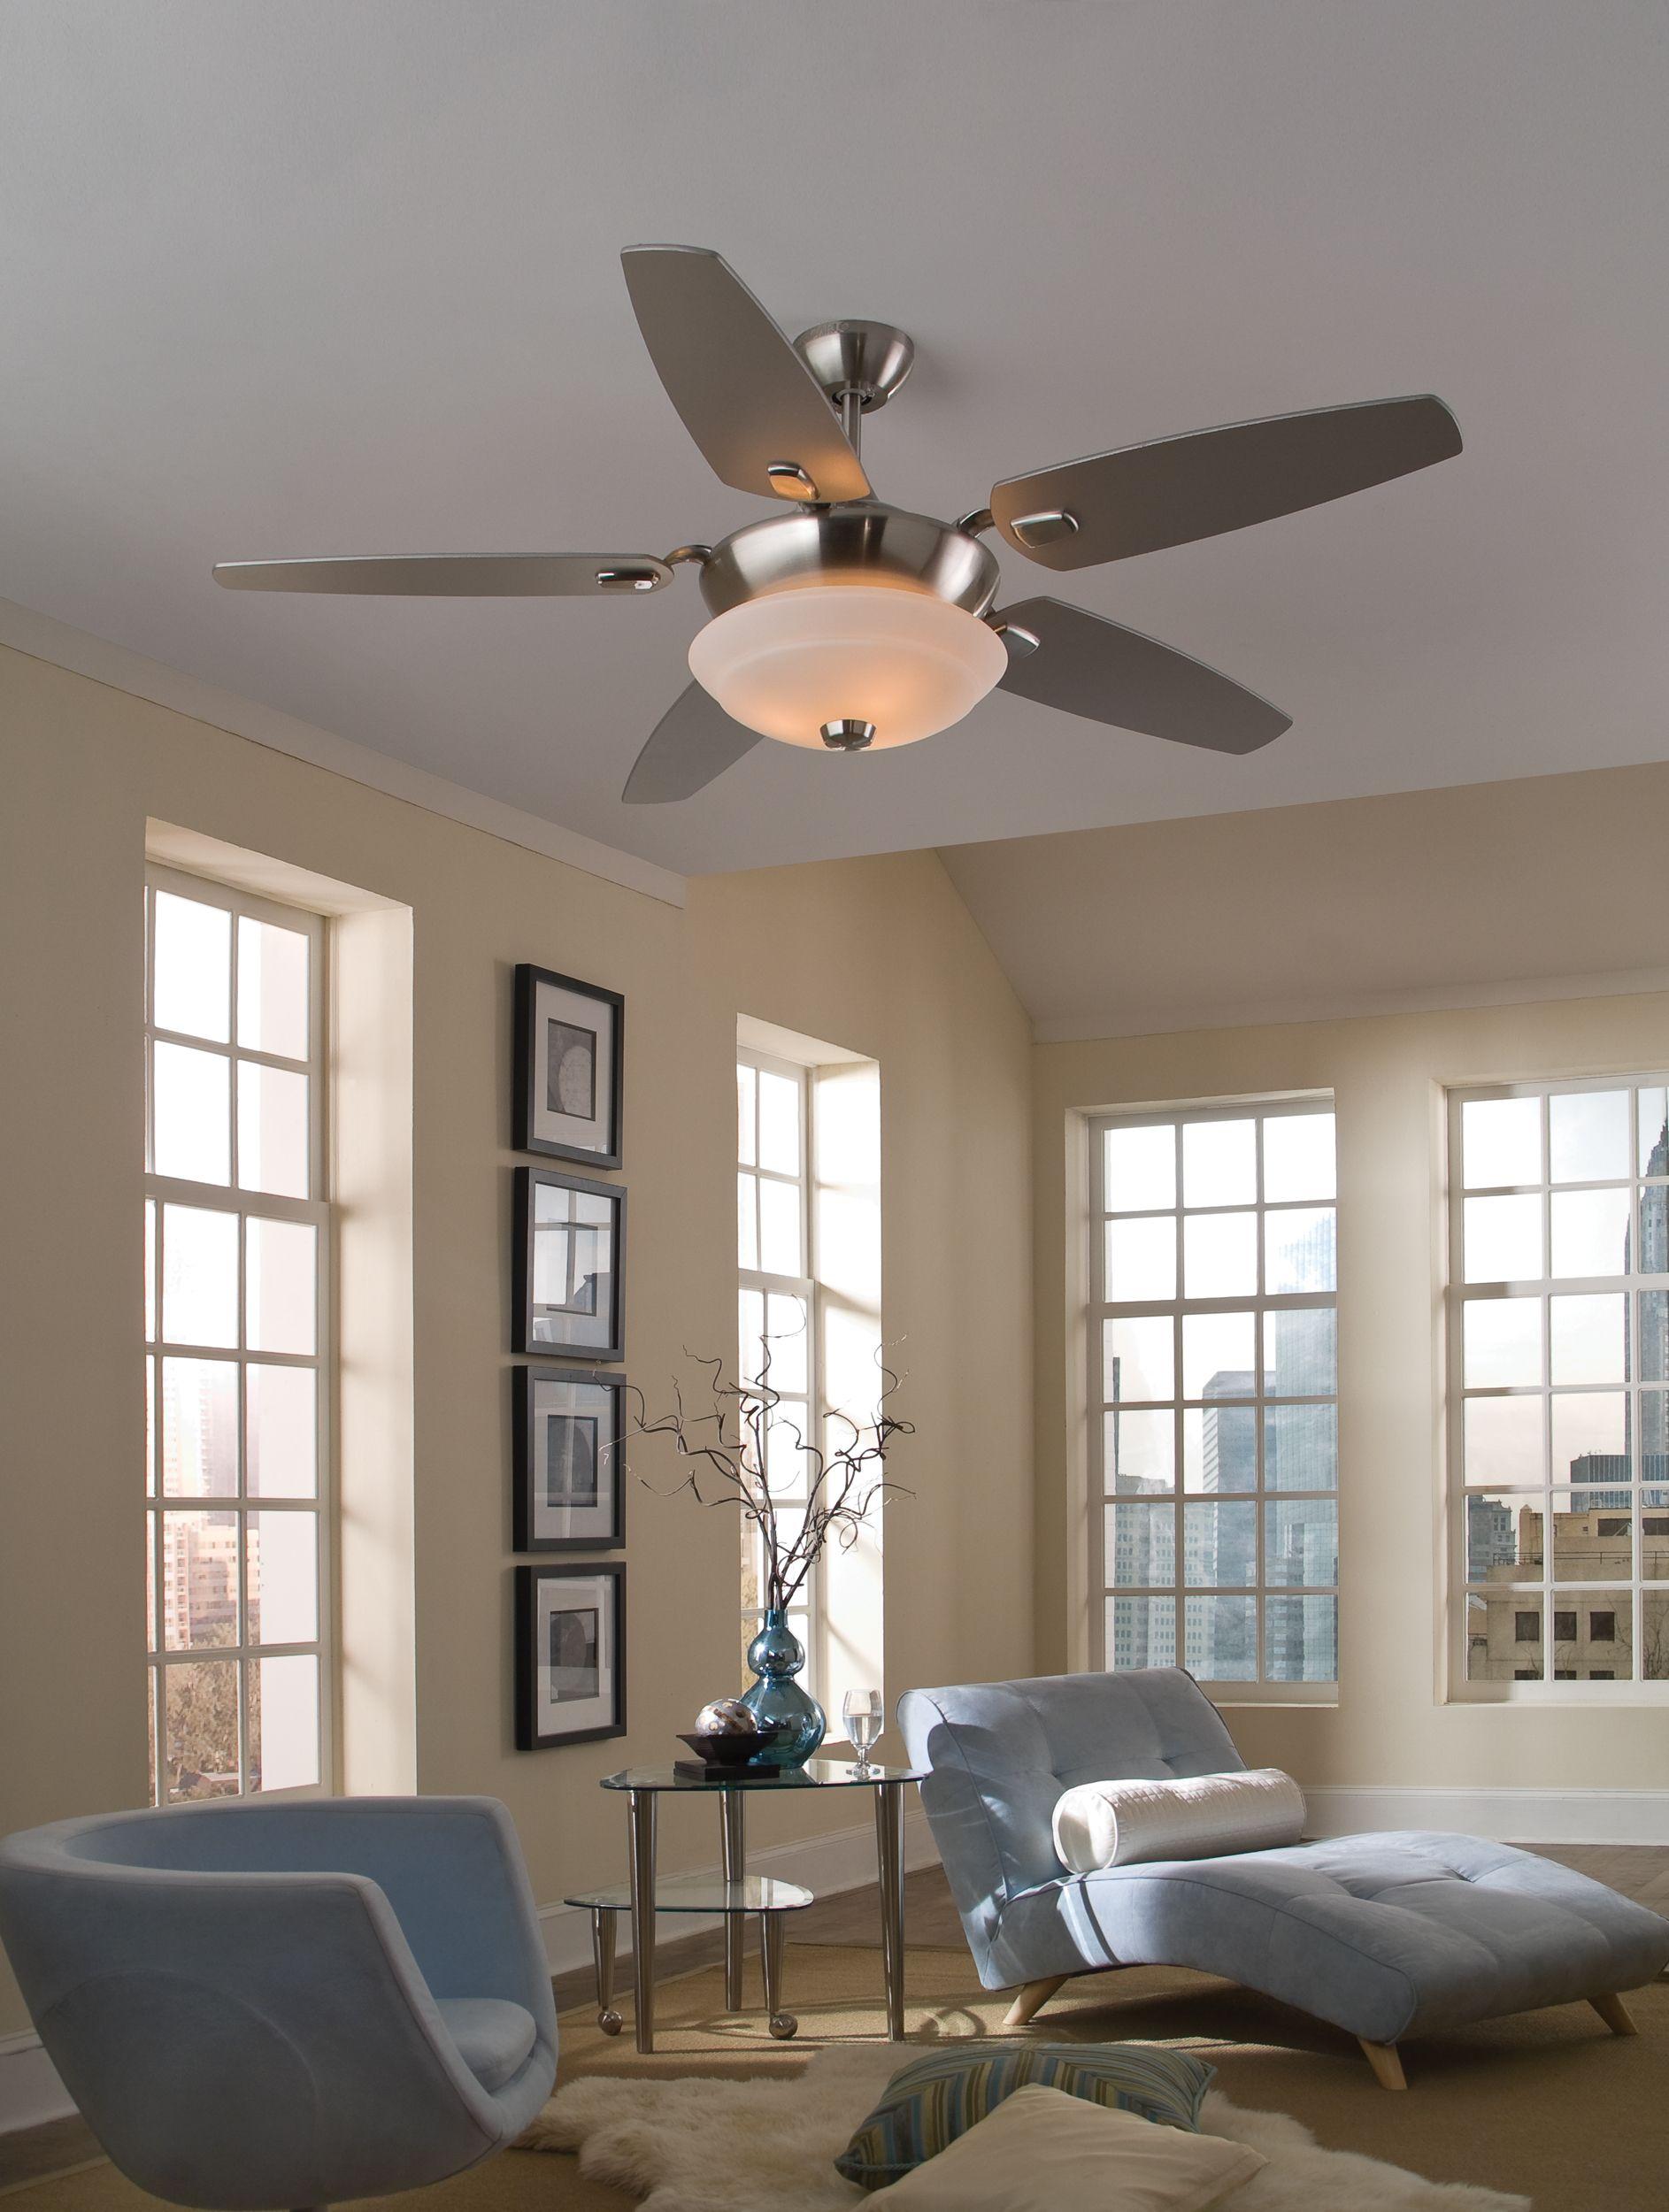 52 solaire fan by monte carlo ceilingfan fanlighting 52 solaire fan by monte carlo ceilingfan fanlighting livingroomdecor aloadofball Choice Image